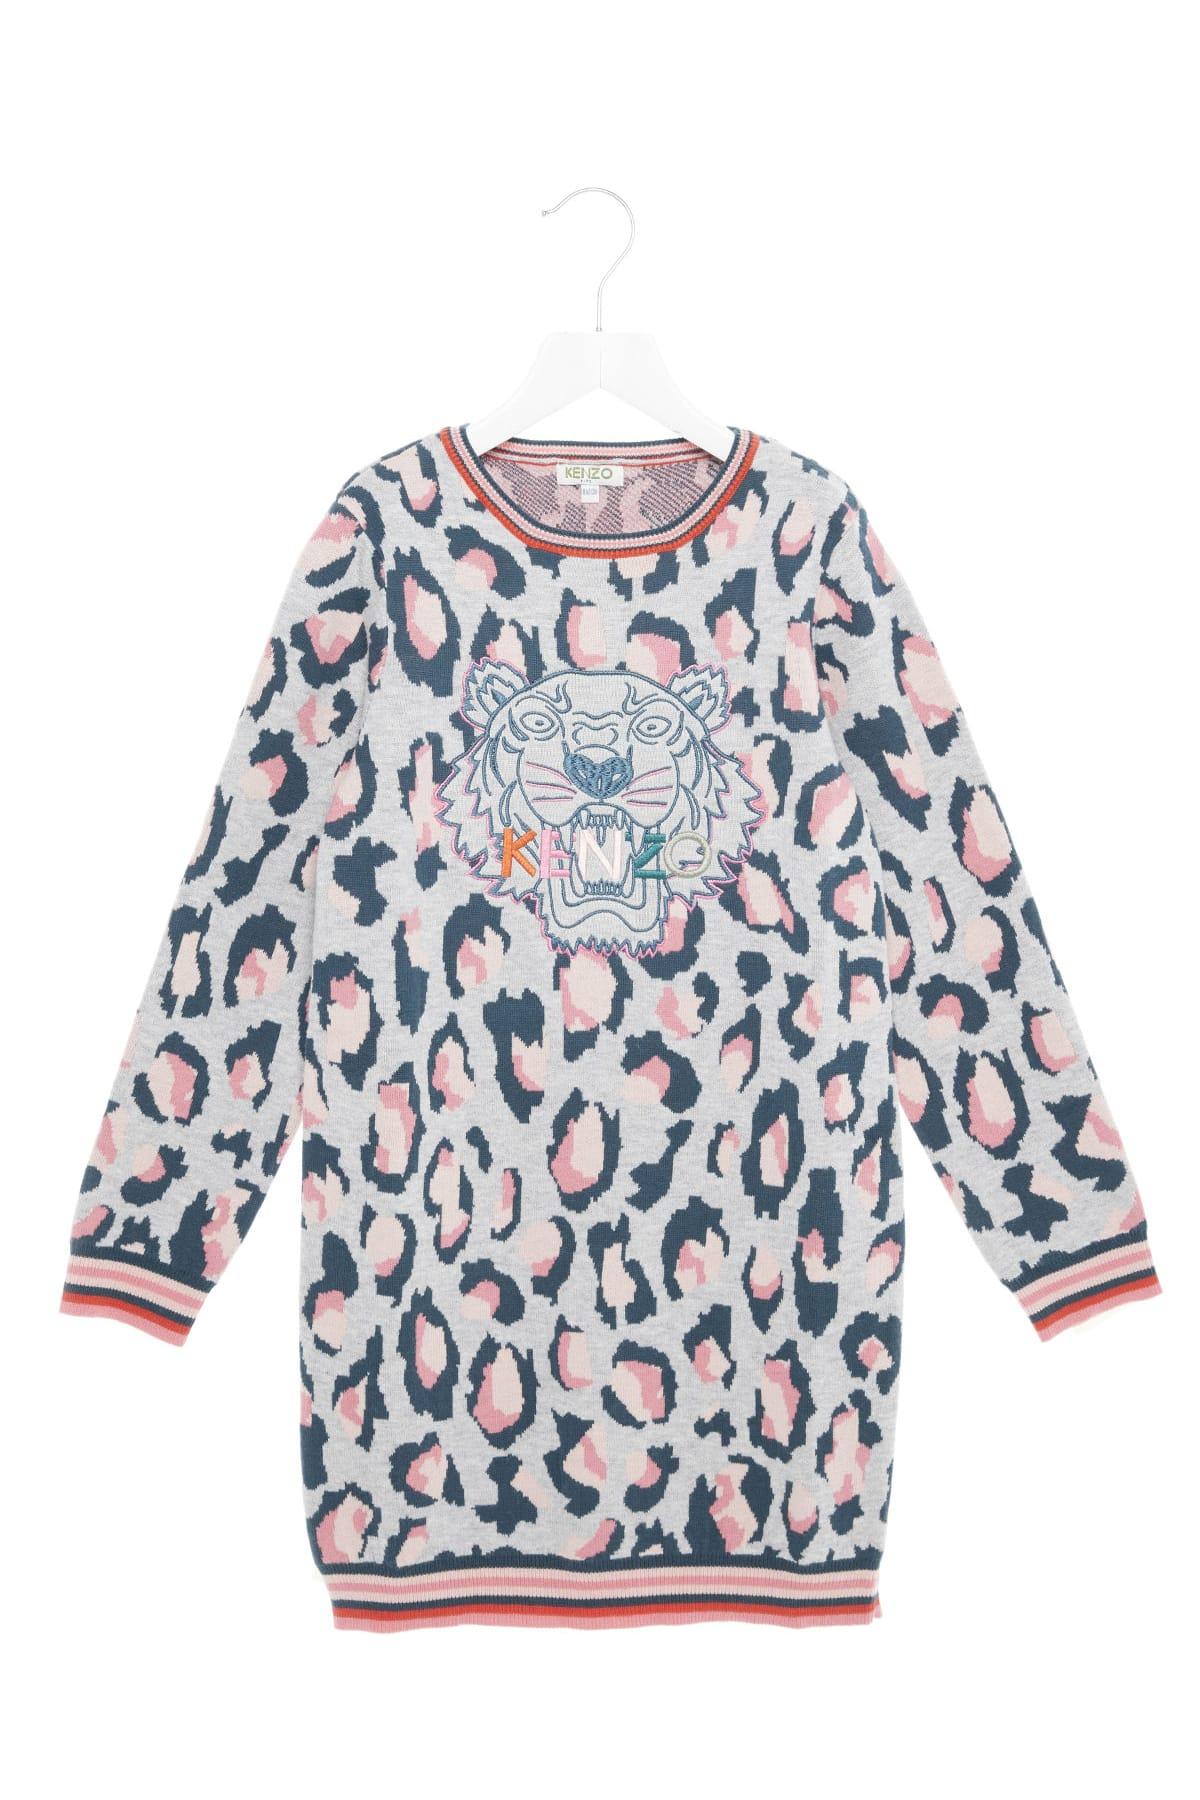 Photo of  Kenzo Kids tiger Jg Dress- shop Kenzo Kids  online sales